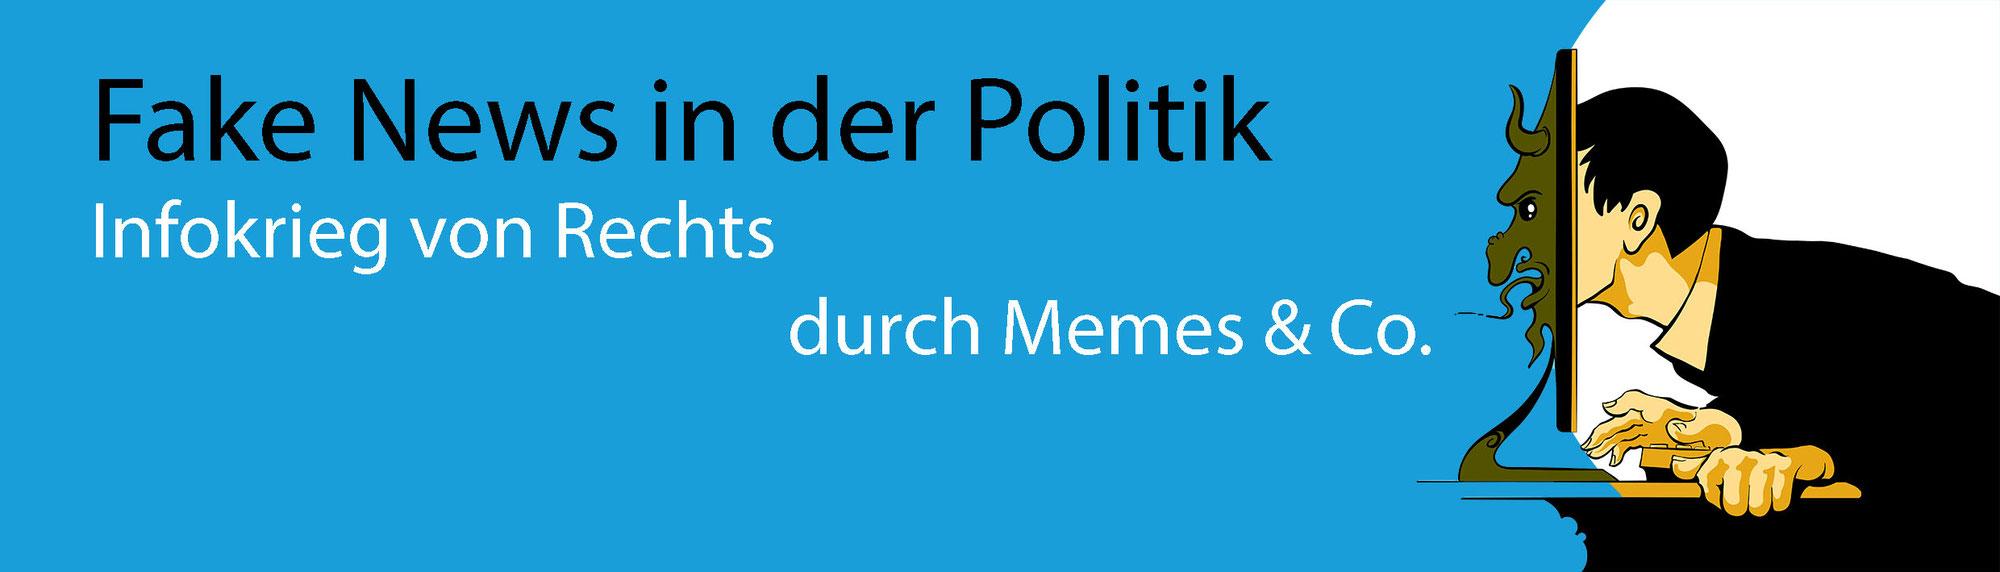 Fake News in der Politik